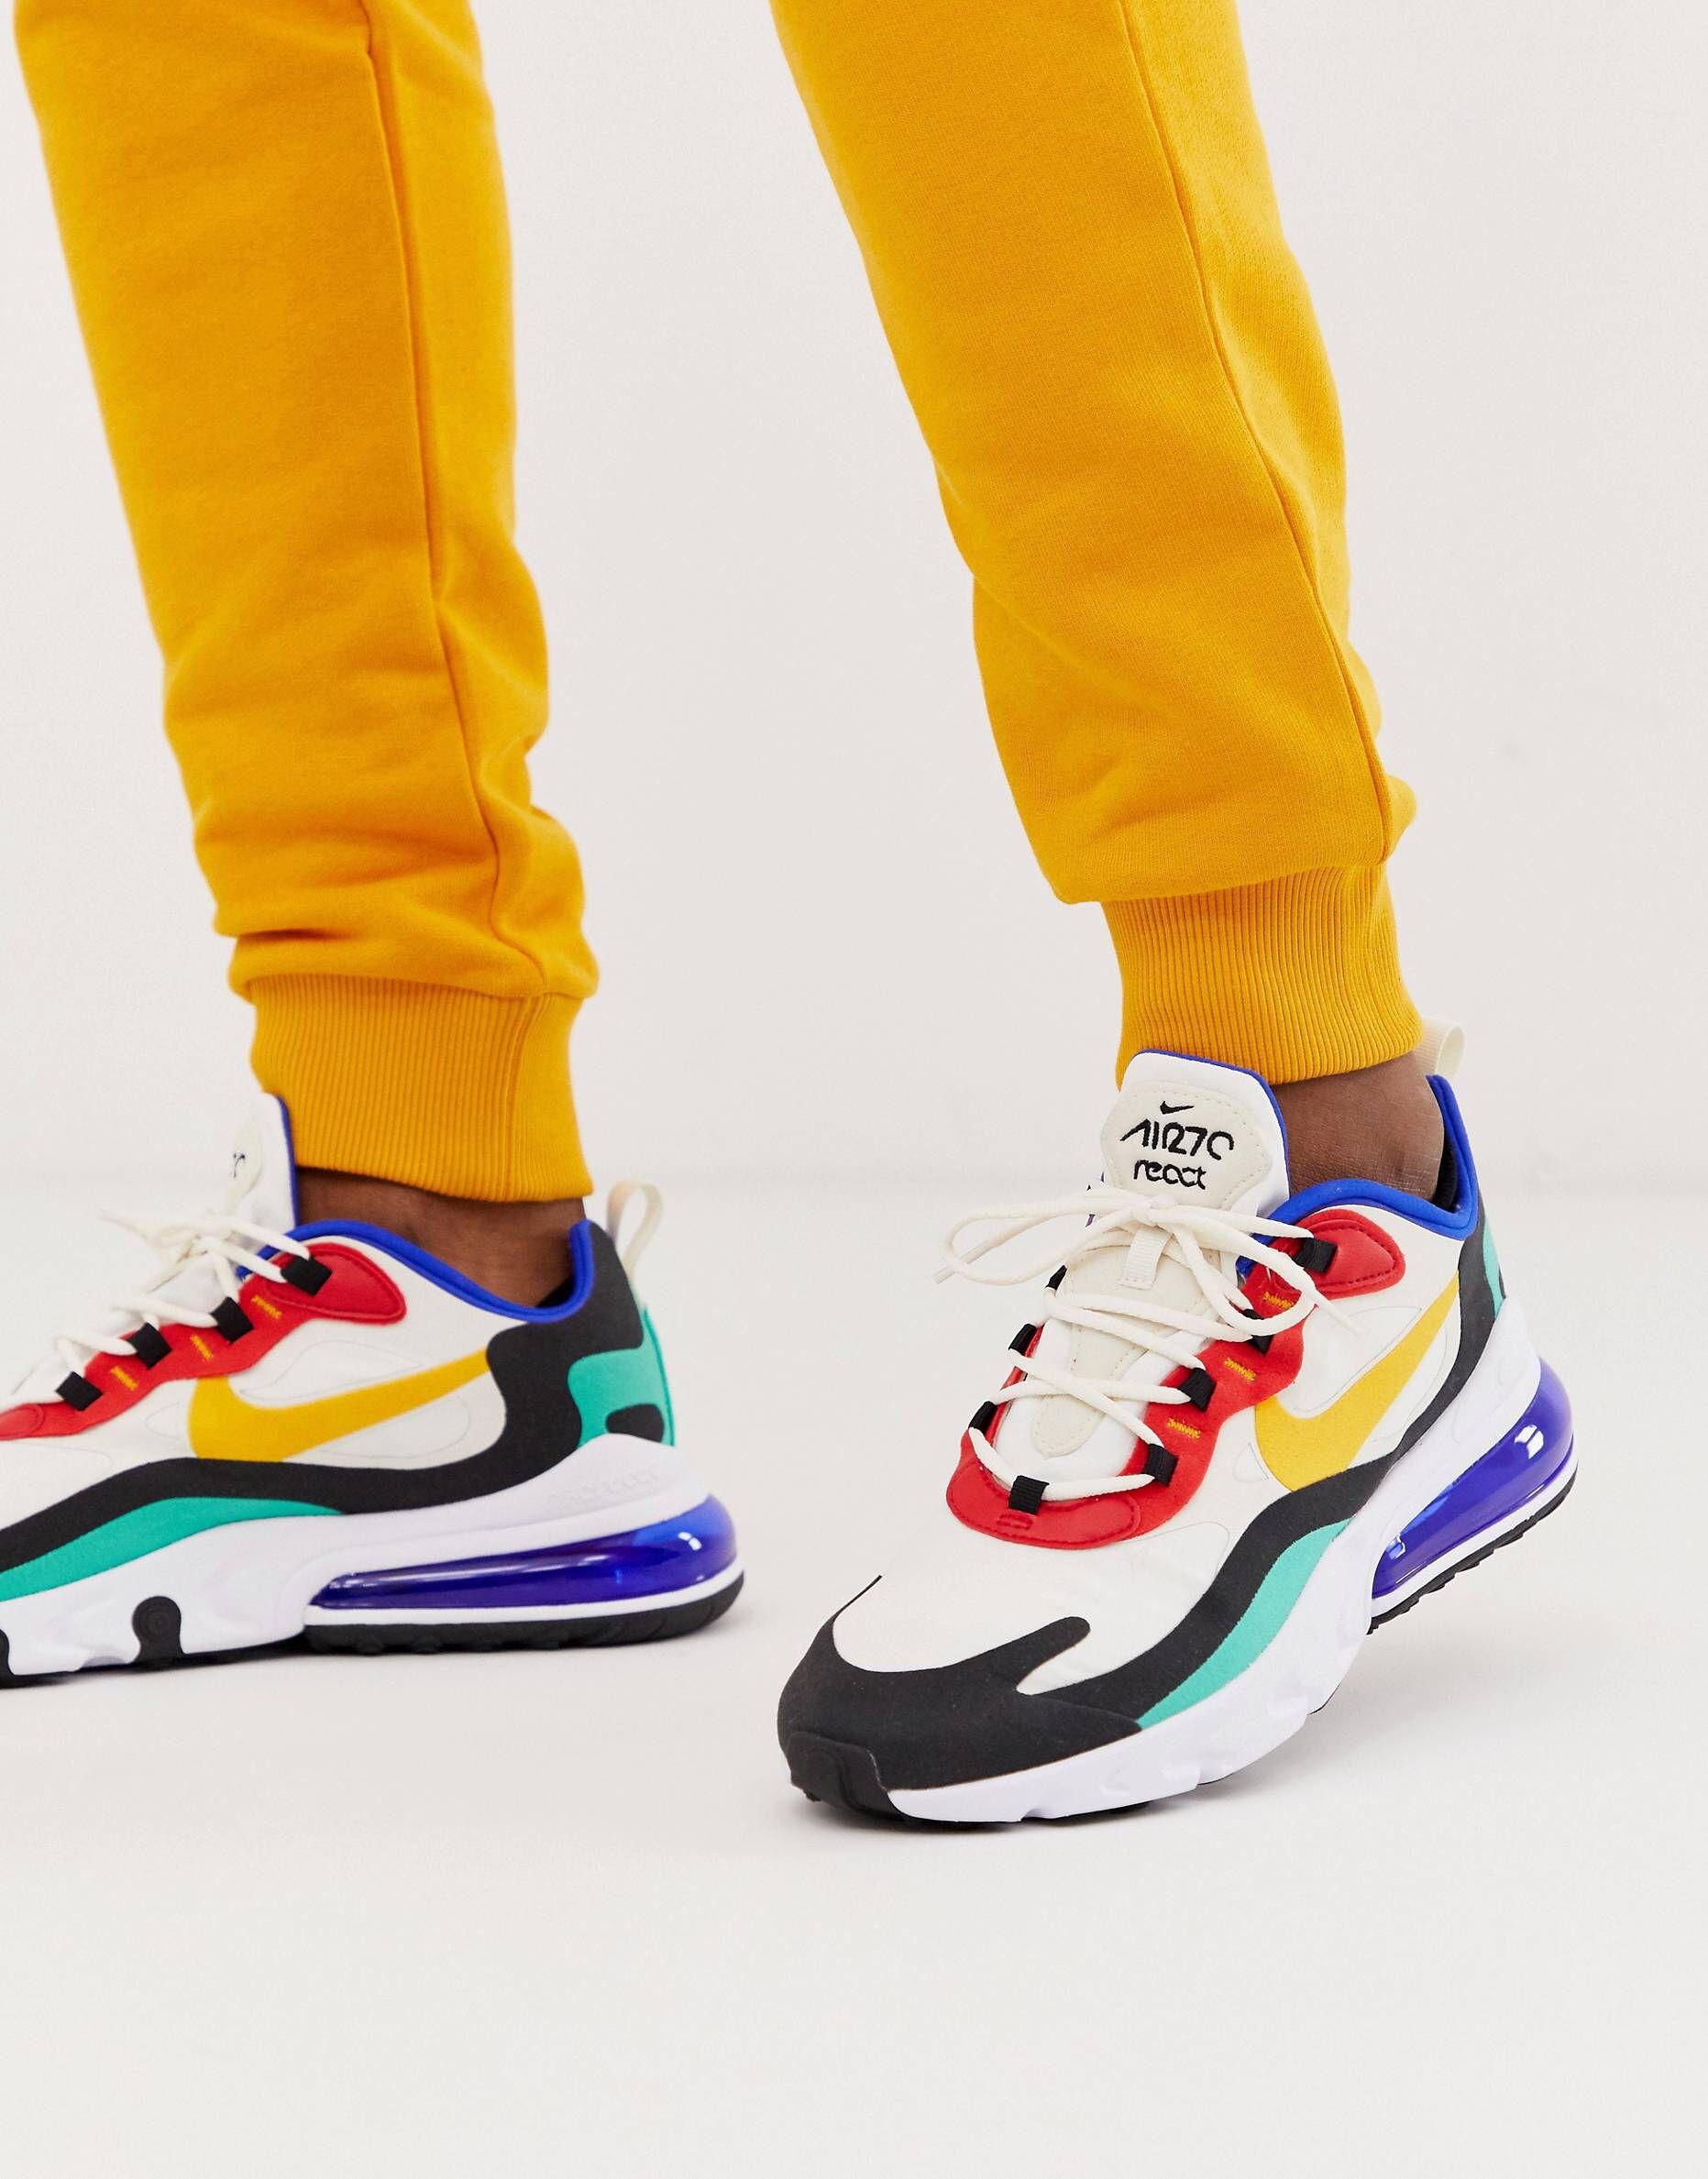 apariencia estética sitio de buena reputación verdadero negocio Pin de Gaia en Noodles Fashion | Zapatos con tacones altos ...